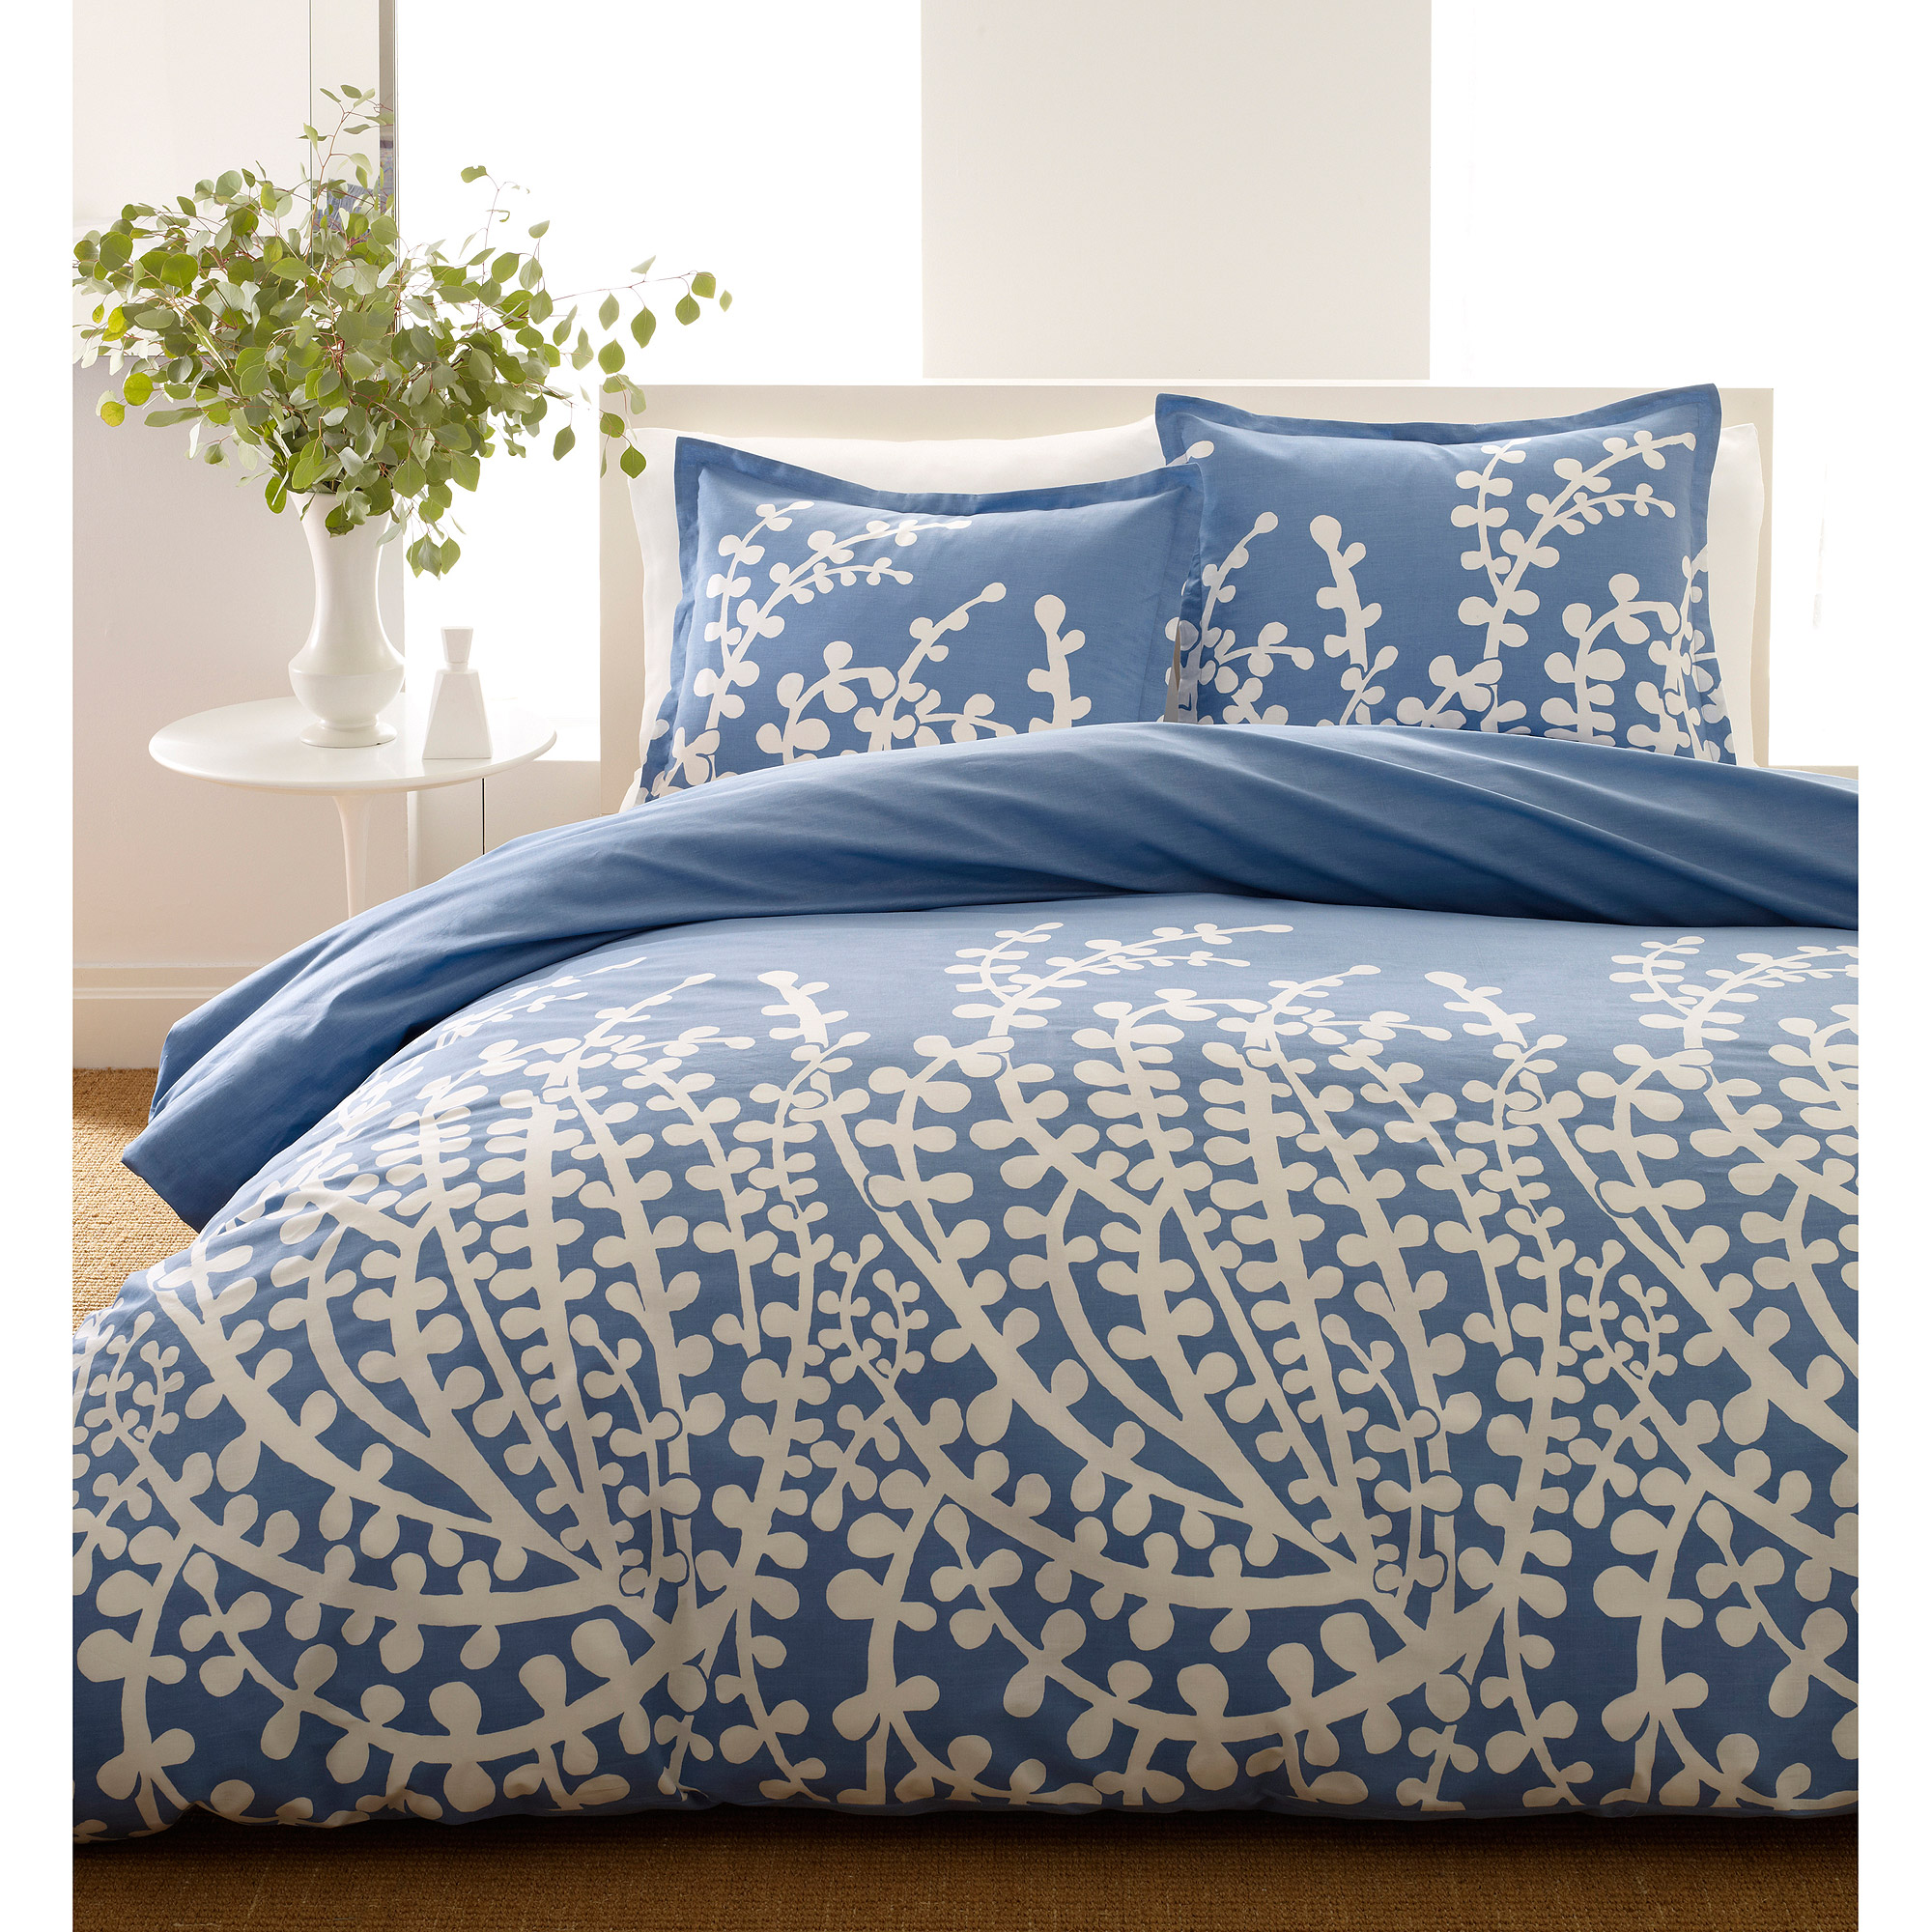 City Scene Branches Mini Bedding Comforter Set